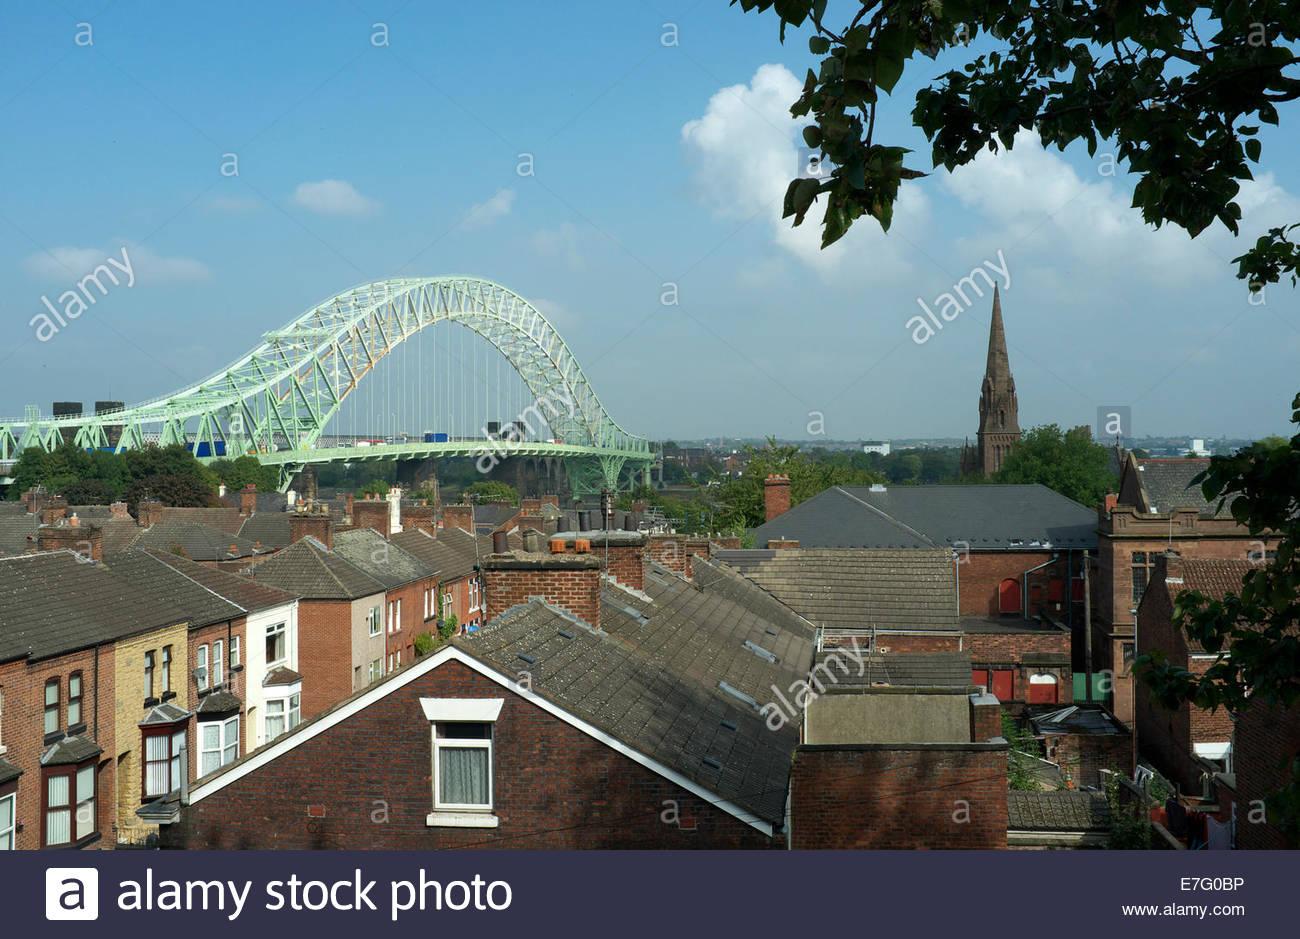 Properties in Runcorn, with the Runcorn - Widnes Bridge (Silver Jubilee Bridge) visible behind. Runcorn, Cheshire, - Stock Image